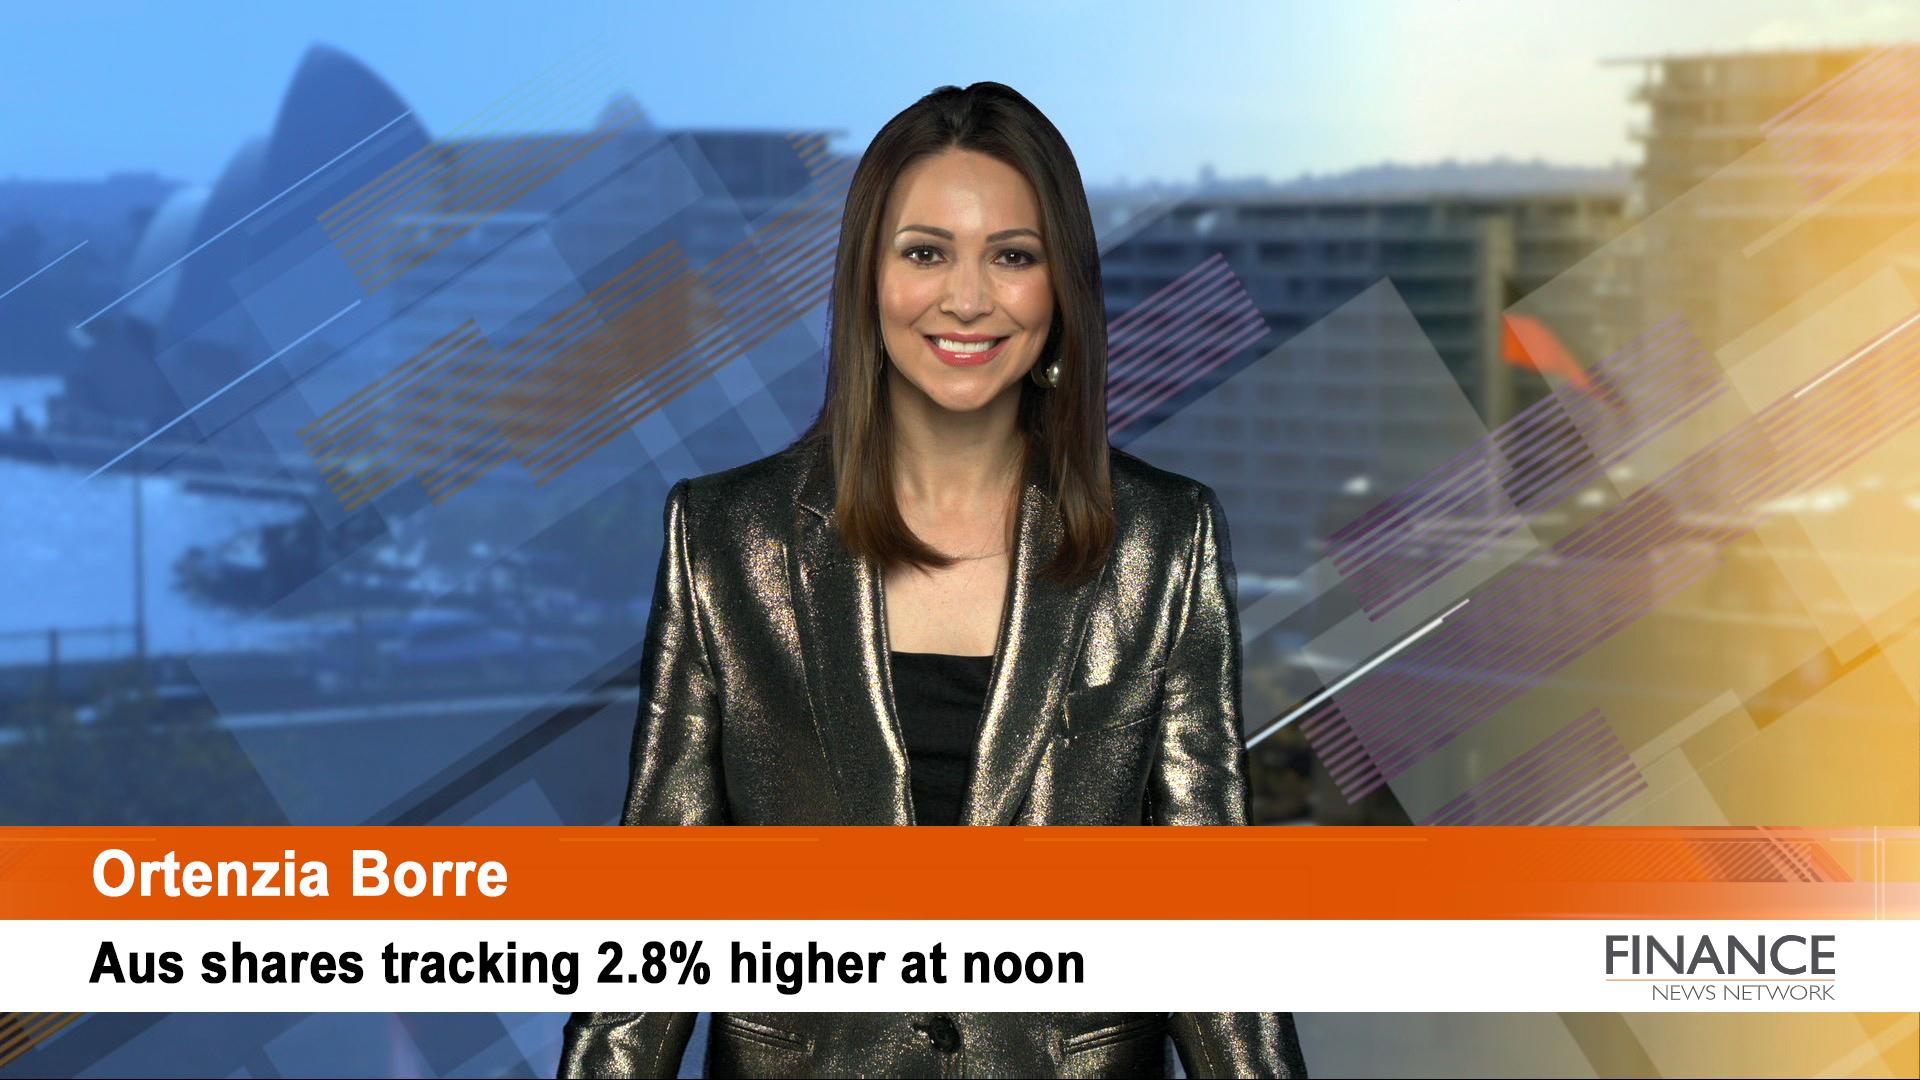 G8 Education (ASX:GEM) extends trading halt: Aus shares 2.8% higher at noon